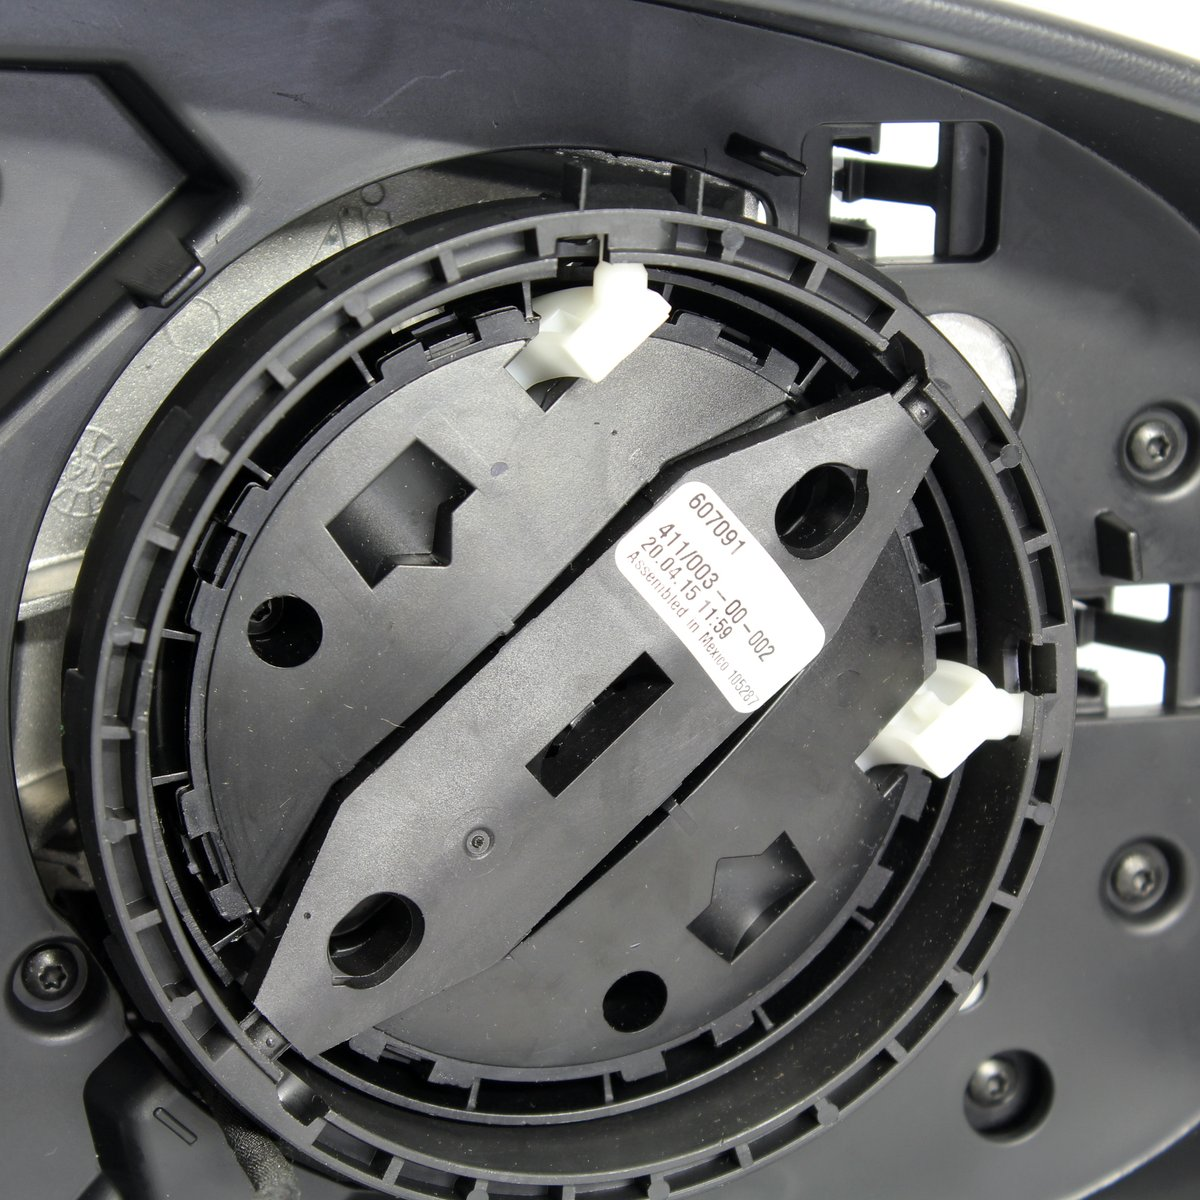 BMW X5 X6 E70 E71 M Antrieb Aussenspiegel Motor Stellmotor verstellmotor 7187262